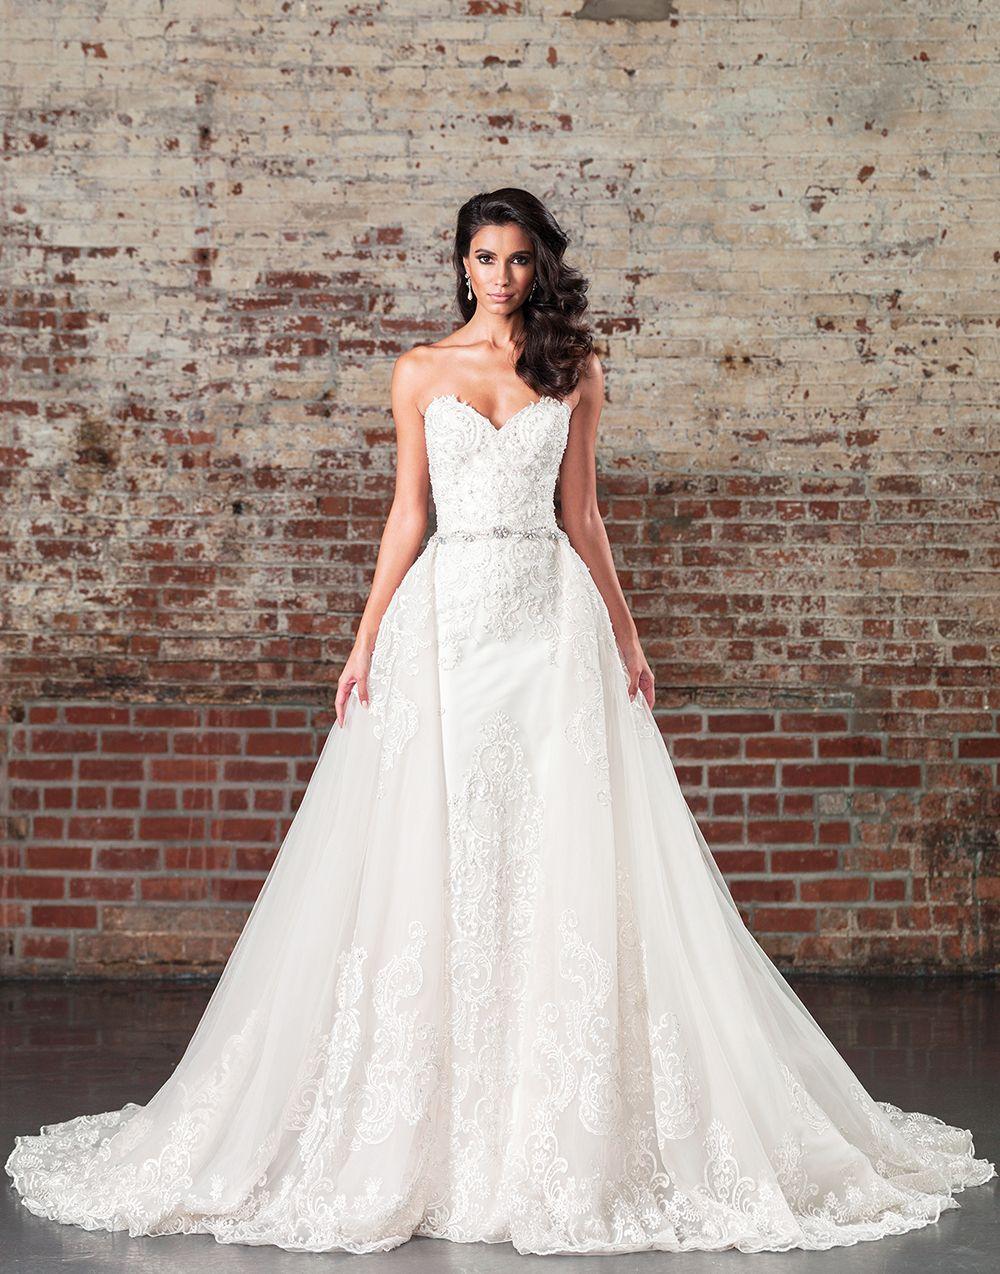 Justin Alexander Signature Wedding Dresses Style 9862